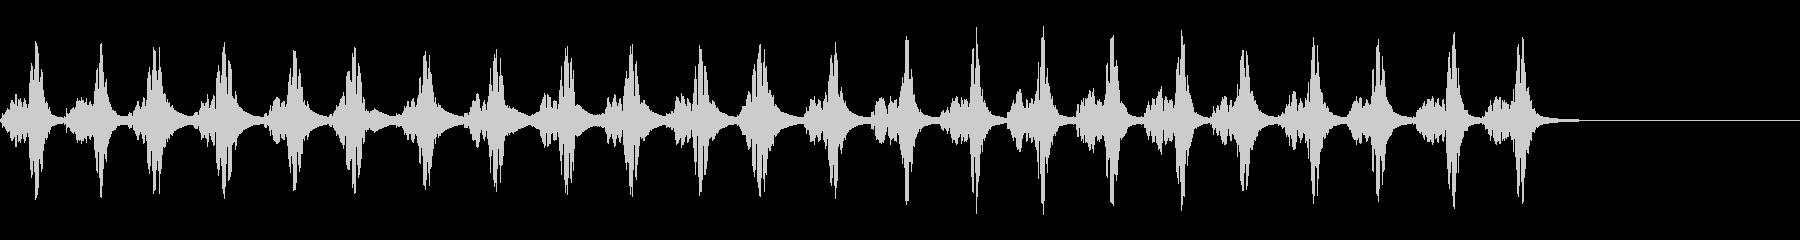 KANTピヨピヨ自主規制音7longの未再生の波形